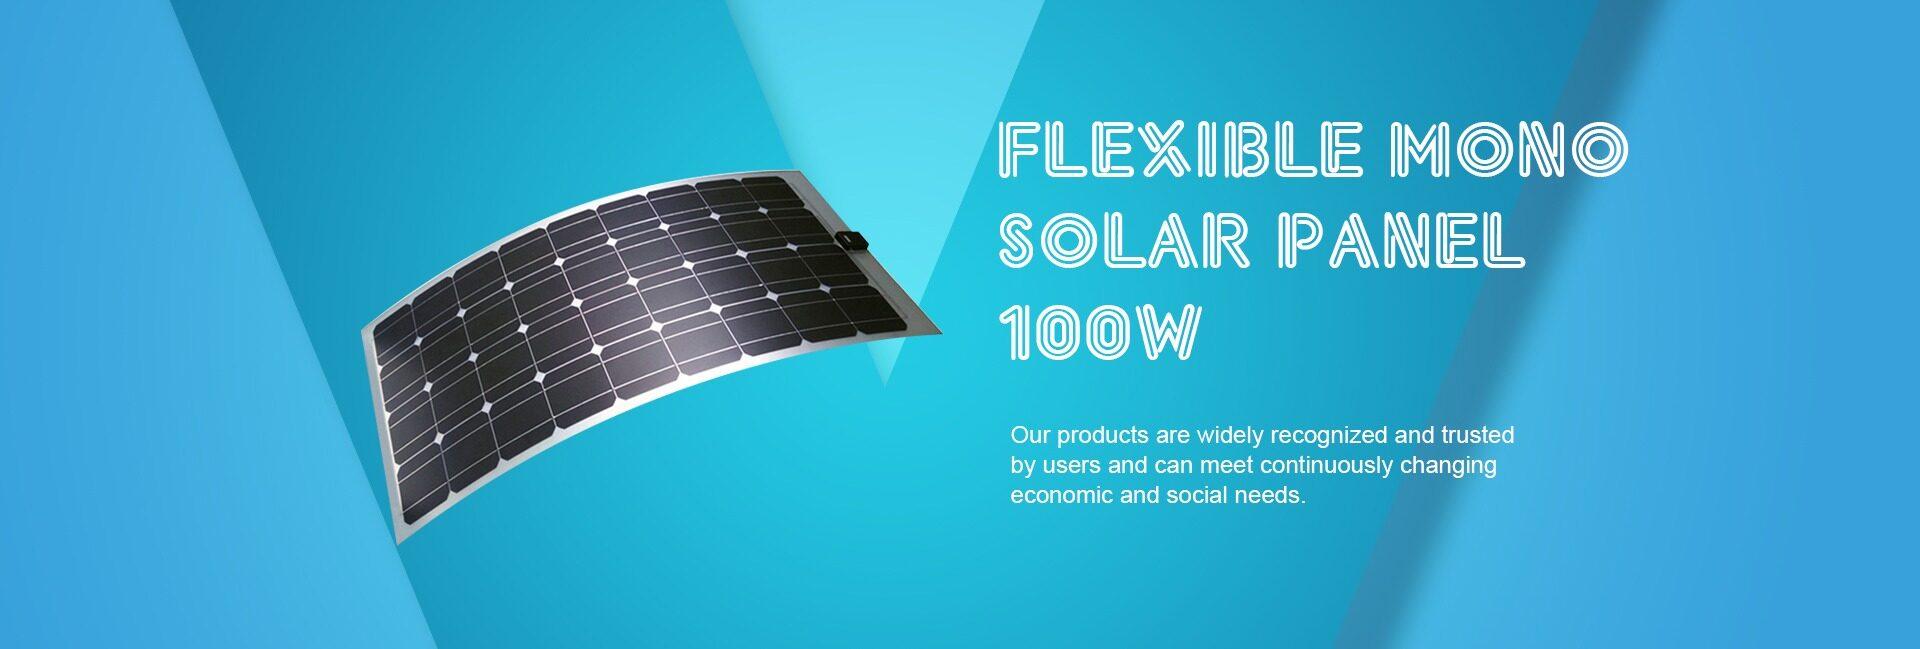 linkkingsmart foldable solar panel